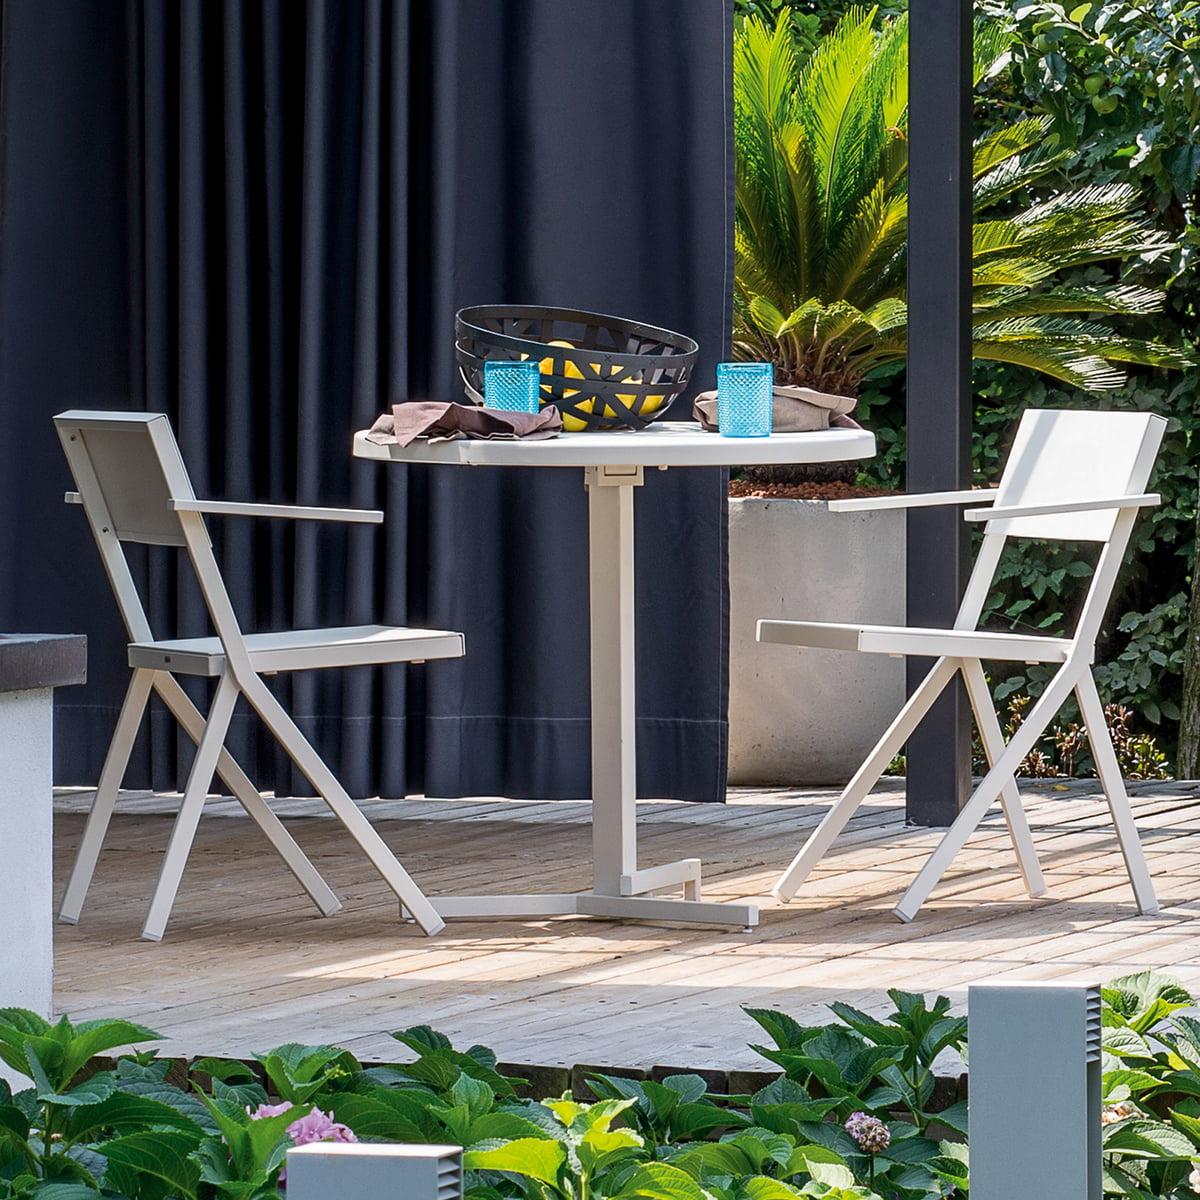 armlehnstuhl mia von emu connox shop. Black Bedroom Furniture Sets. Home Design Ideas